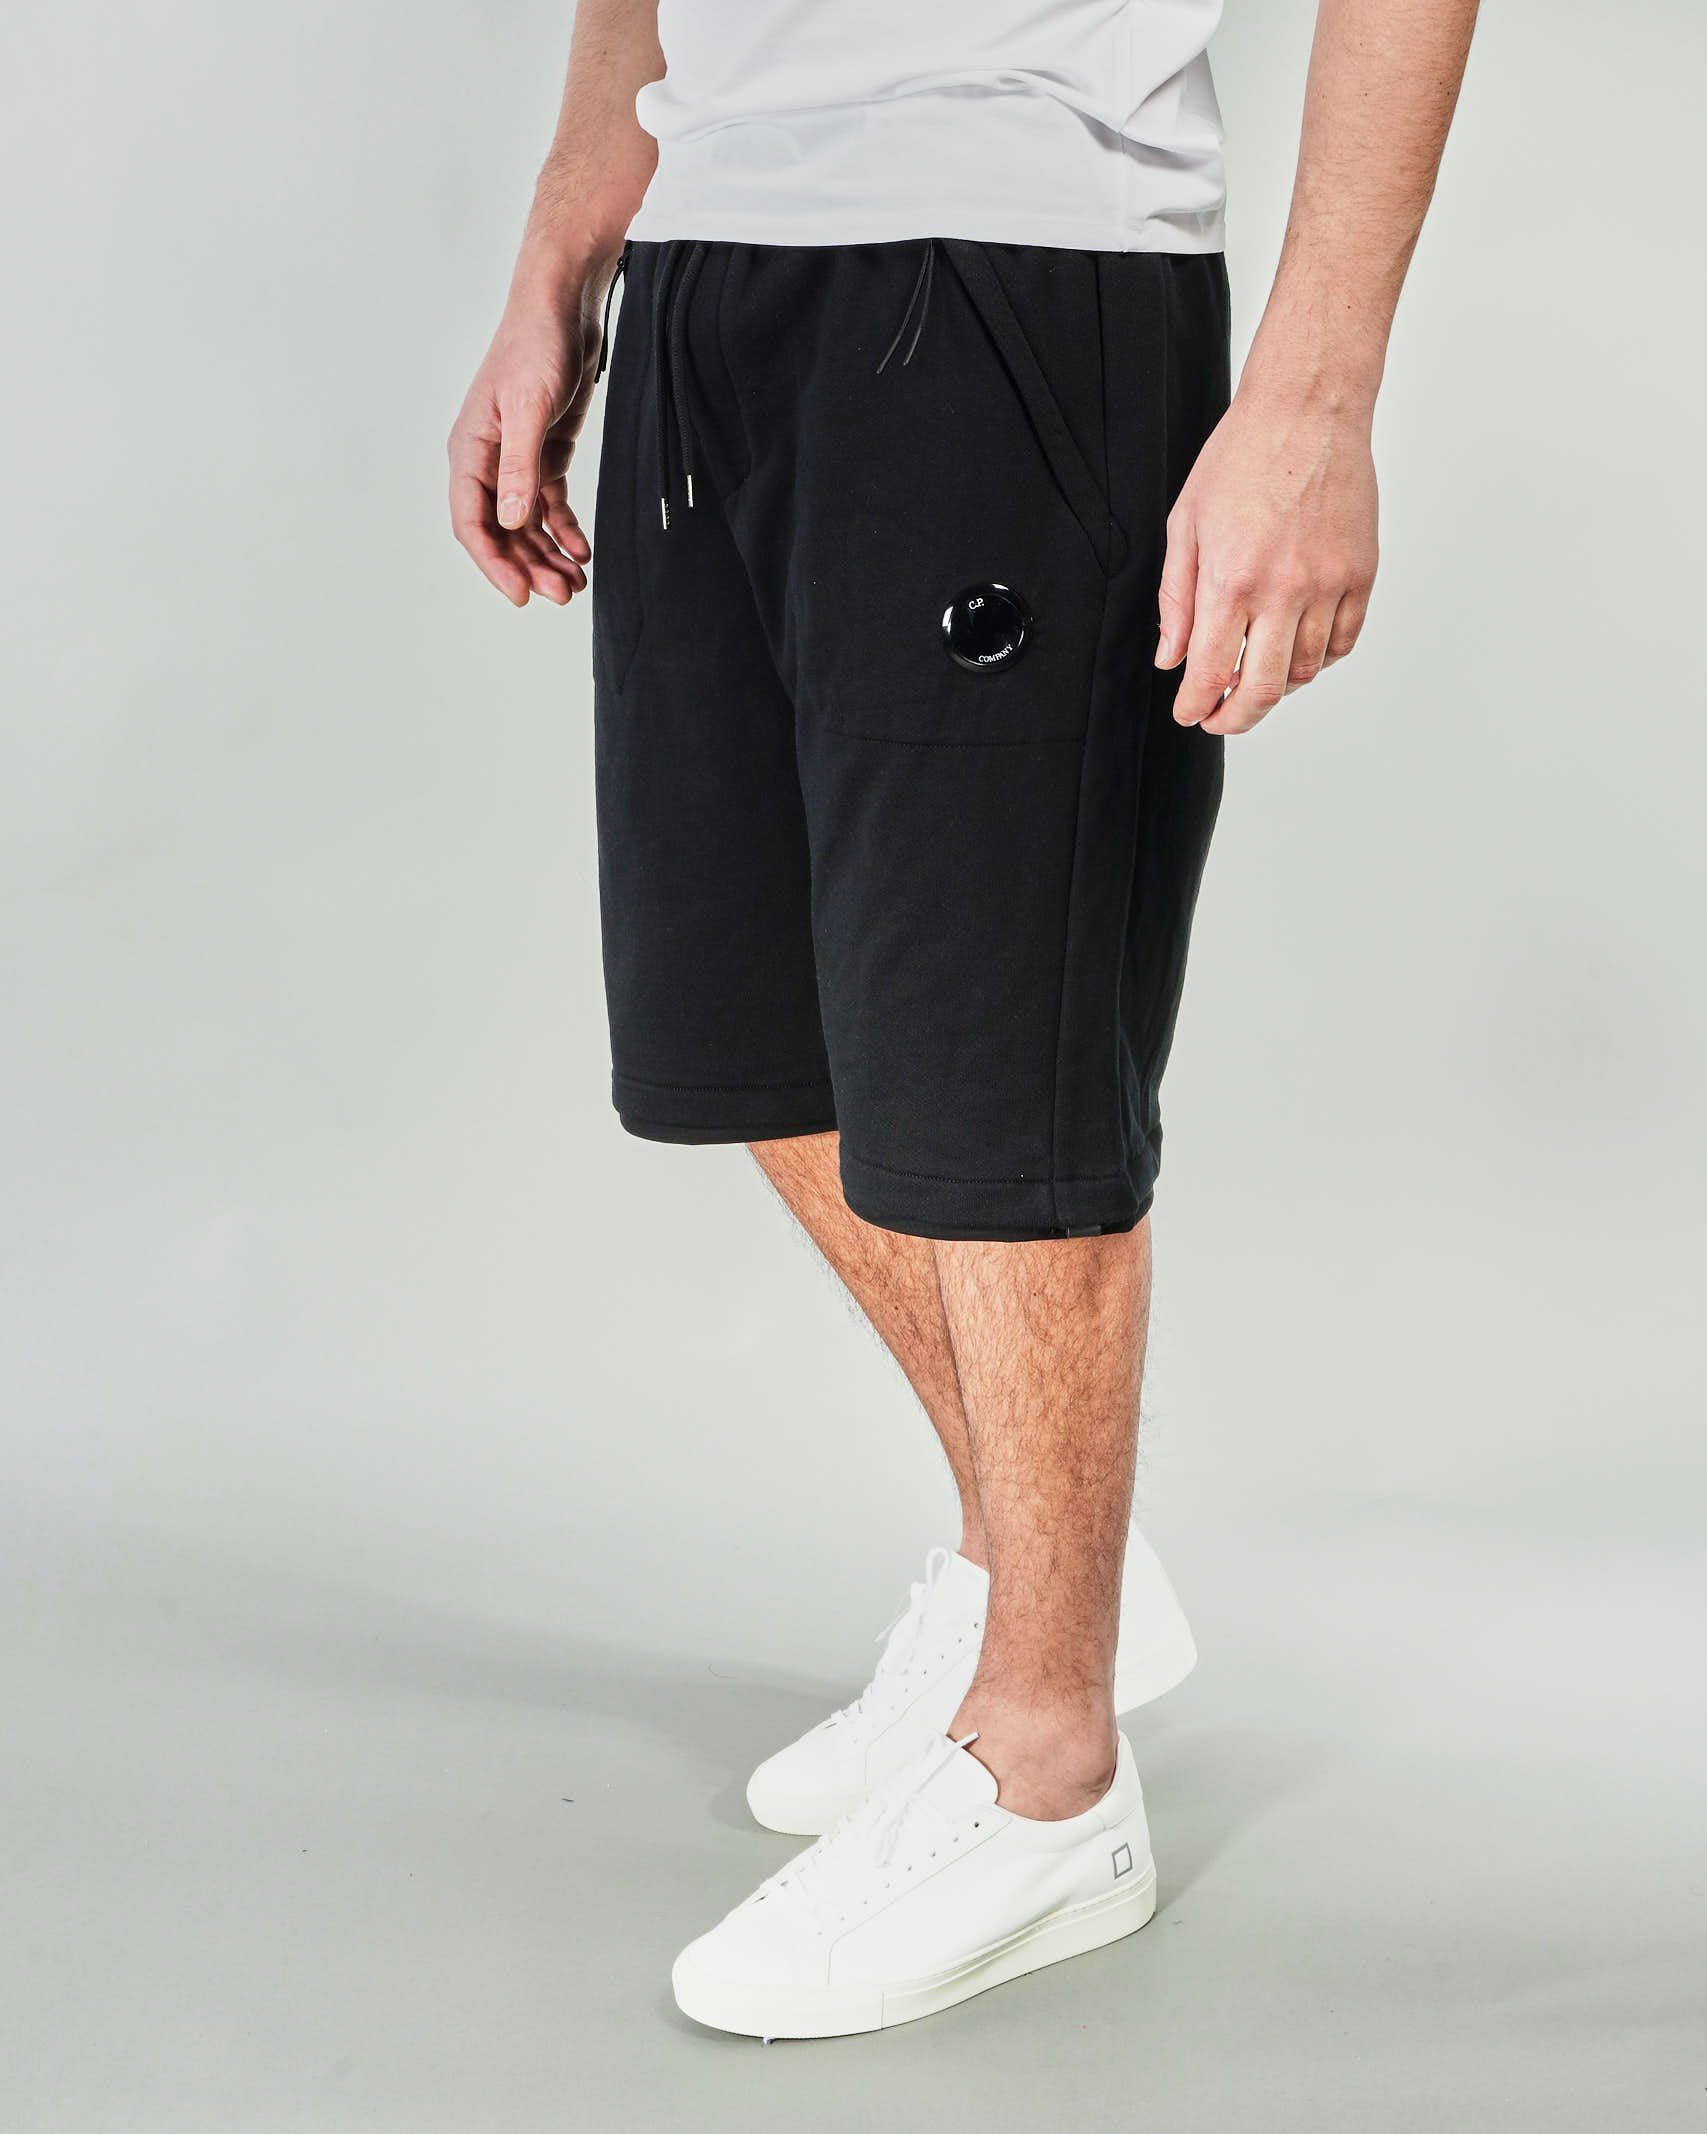 Bermuda Diagonal Raised Fleece C.P. Company C.P. COMPANY | Pantalone | 10CMSB129A005086W999